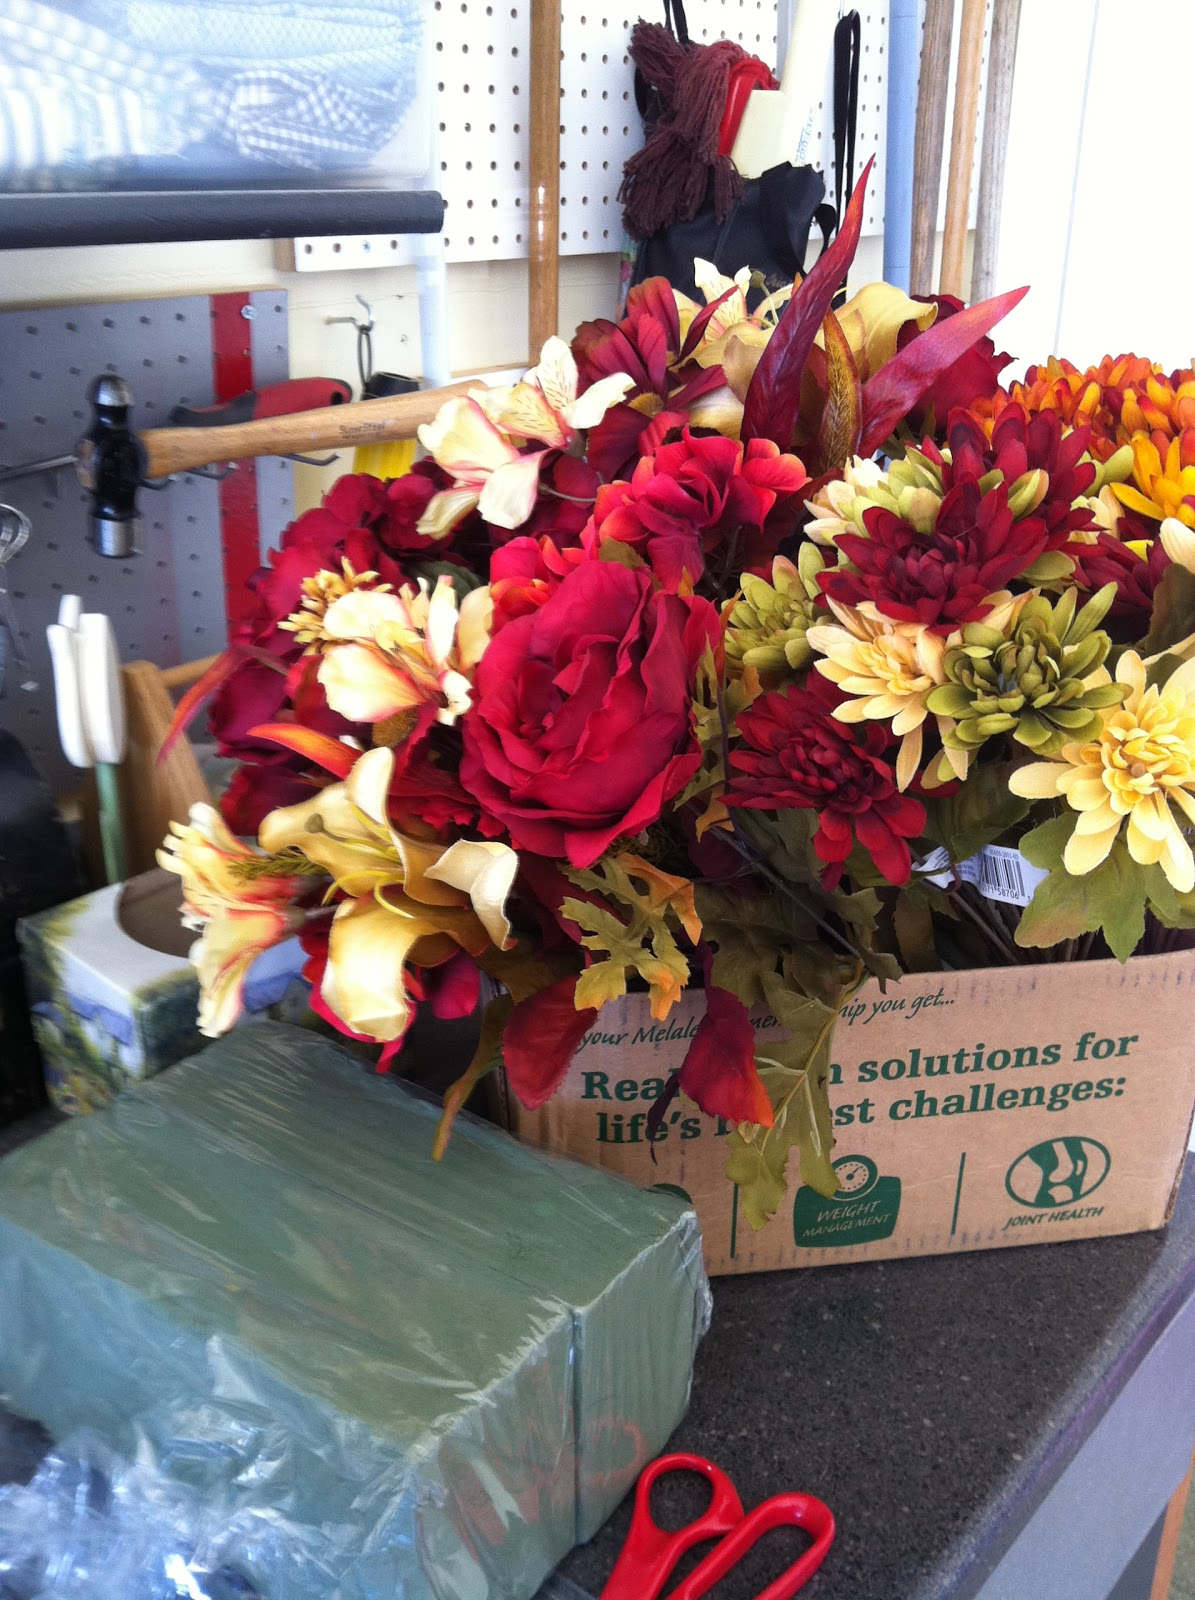 Buttons, Bows & Bling: Fall Floral Arrangements